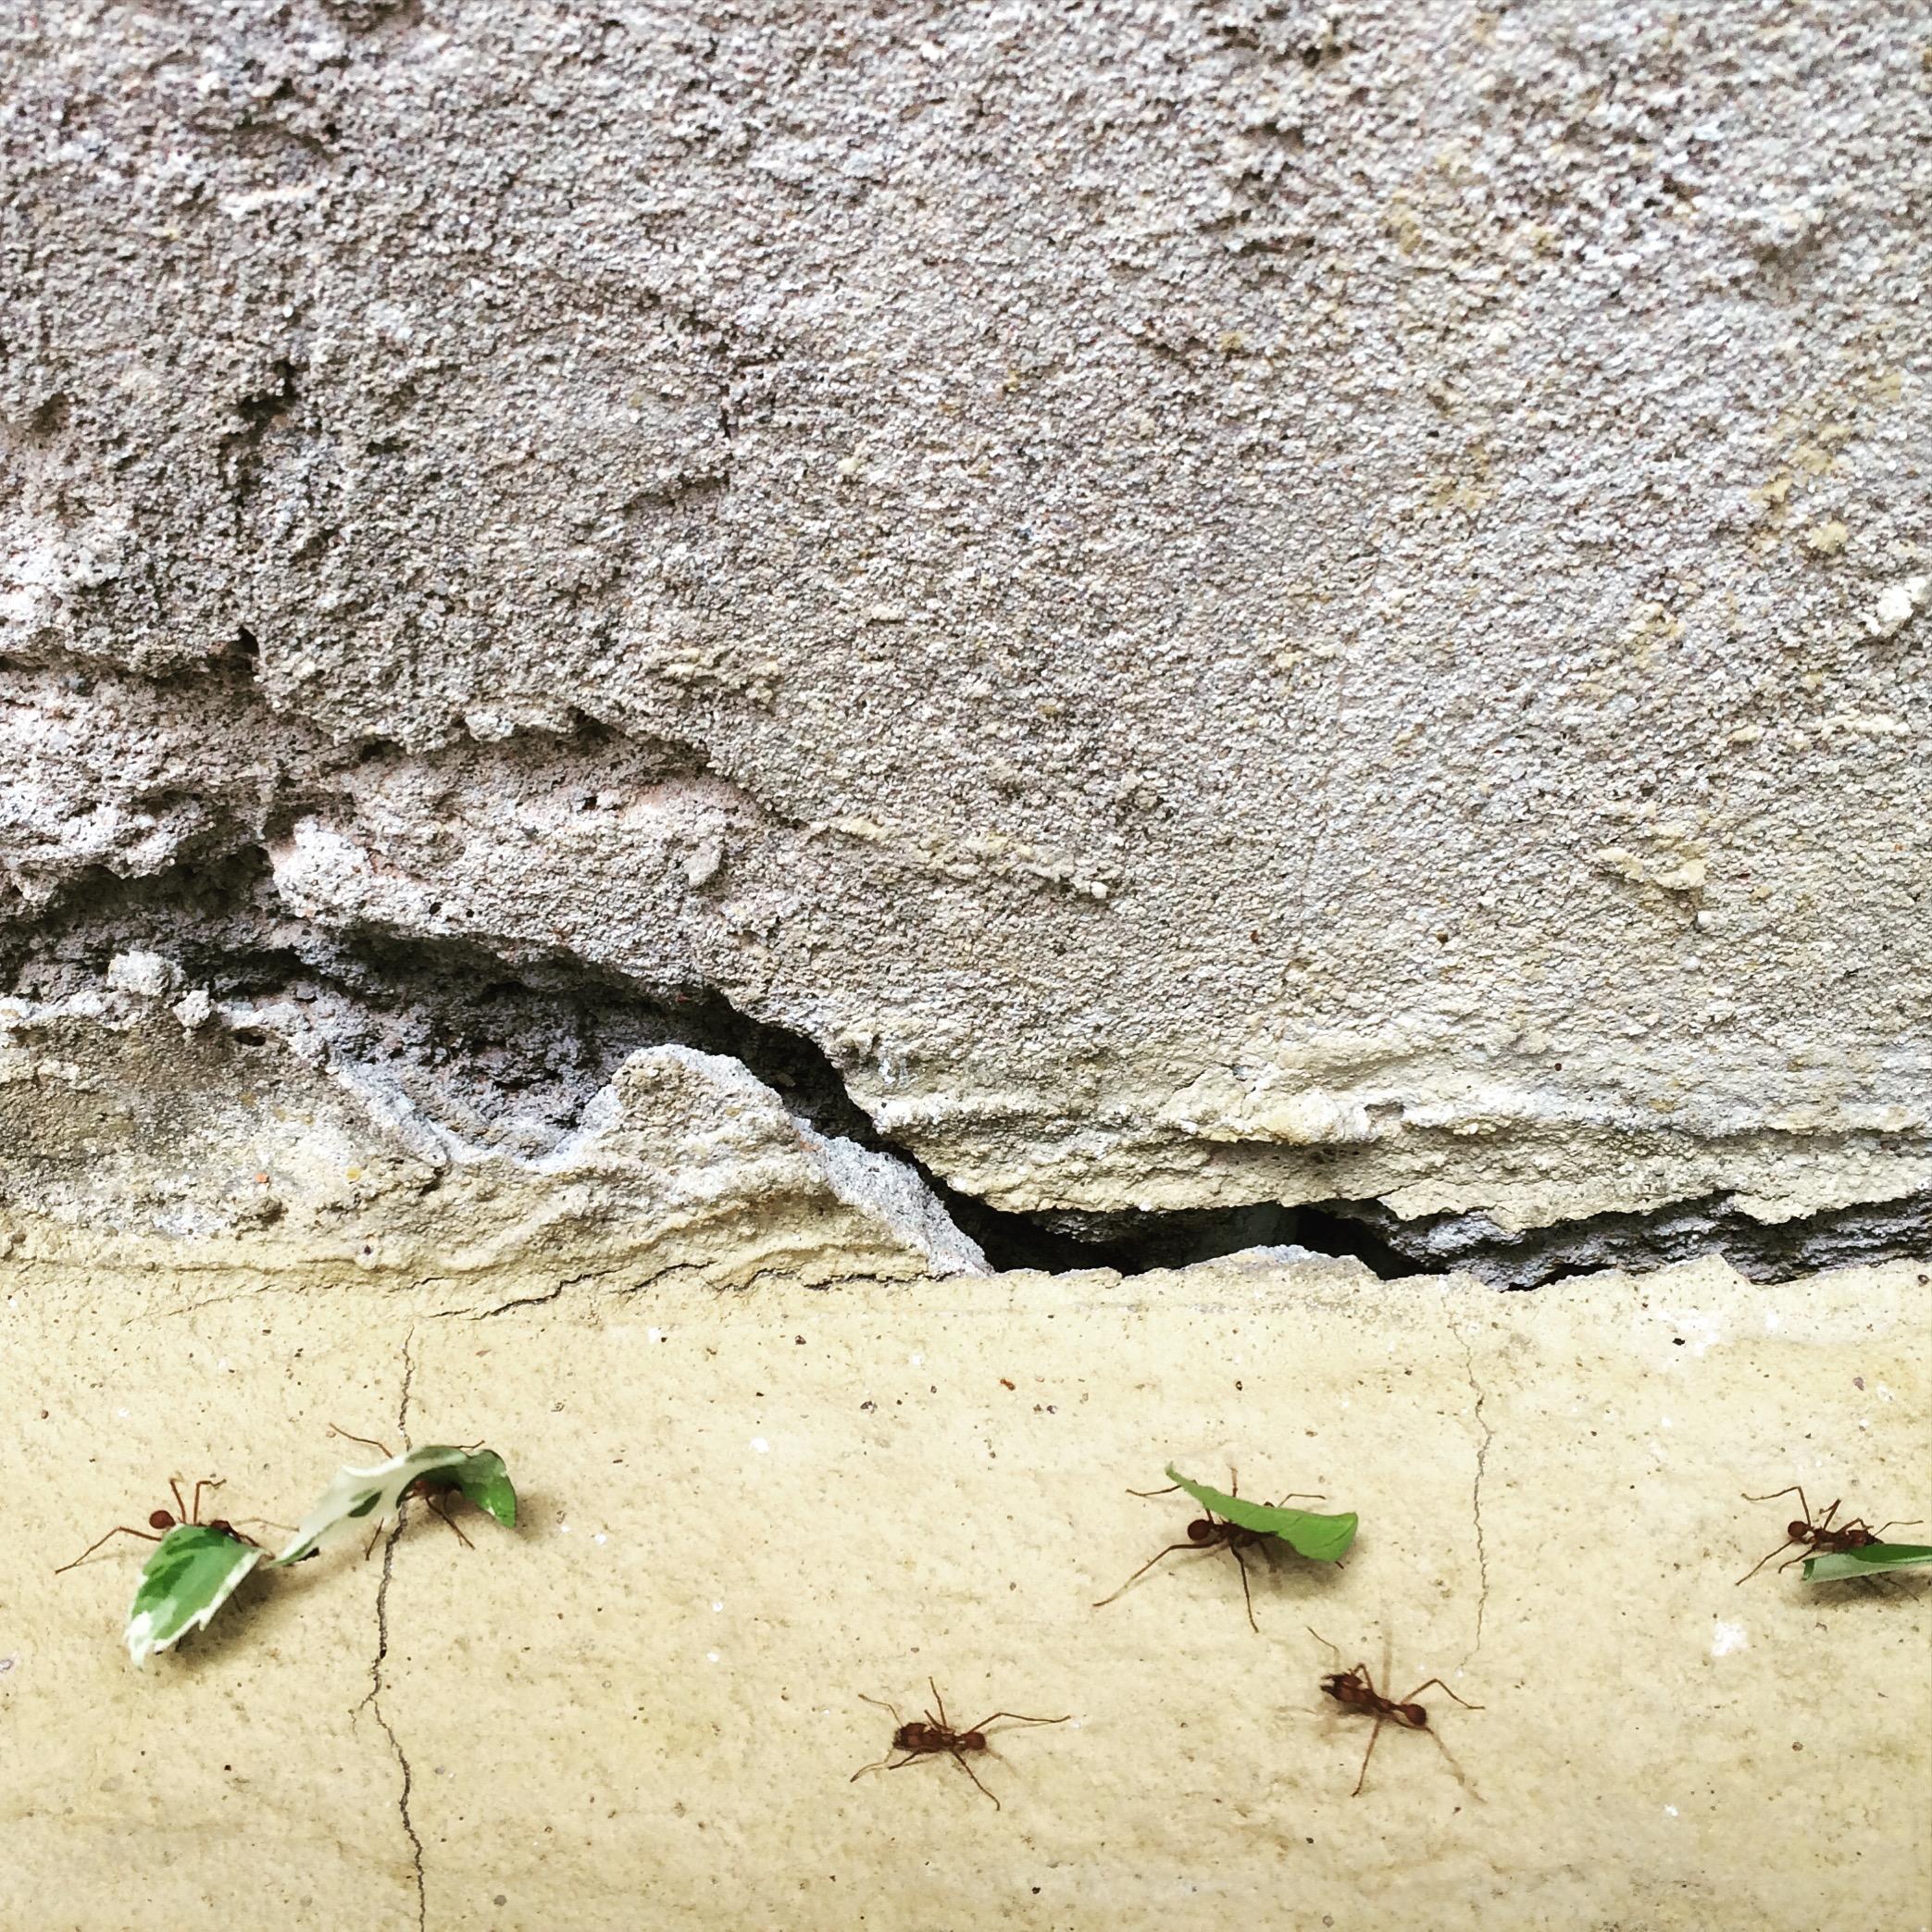 leaf cutter ants v. hibiscus tree